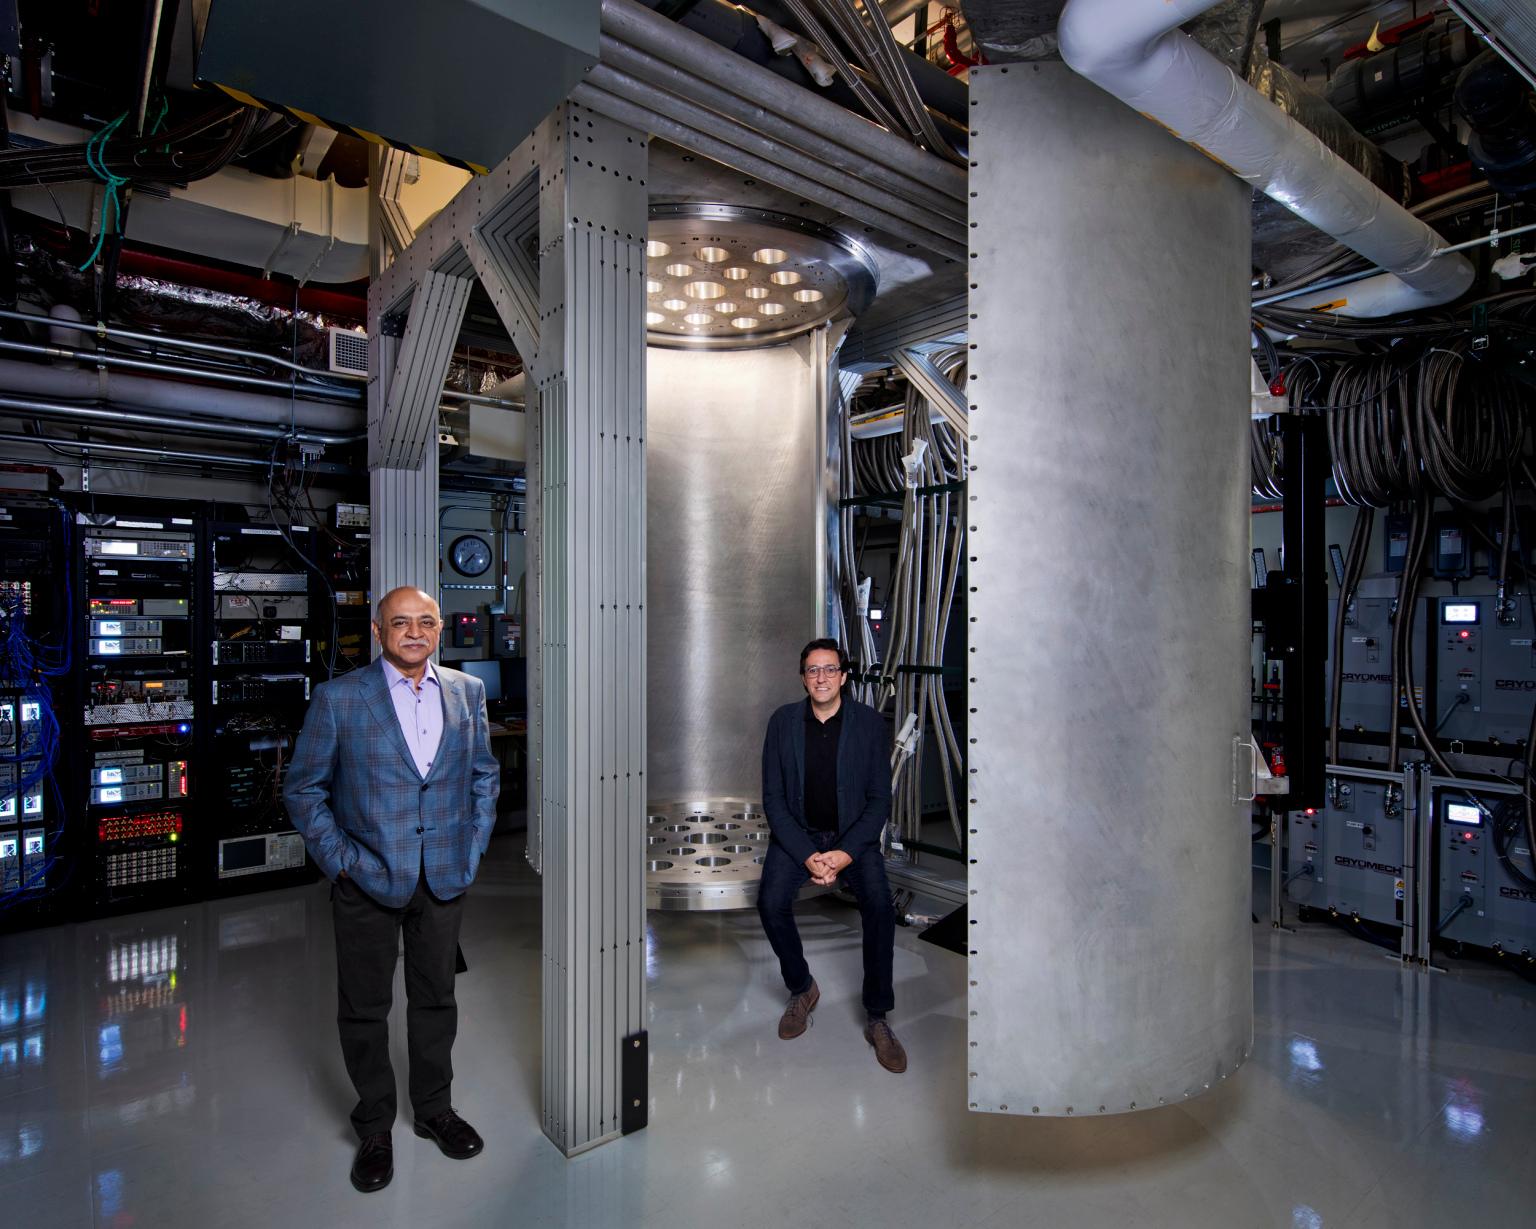 20200919.IBM-publishes-its-quantum-roadmap-says-it-will-have-a-1000-qubit-machine-in-2023-01.jpg